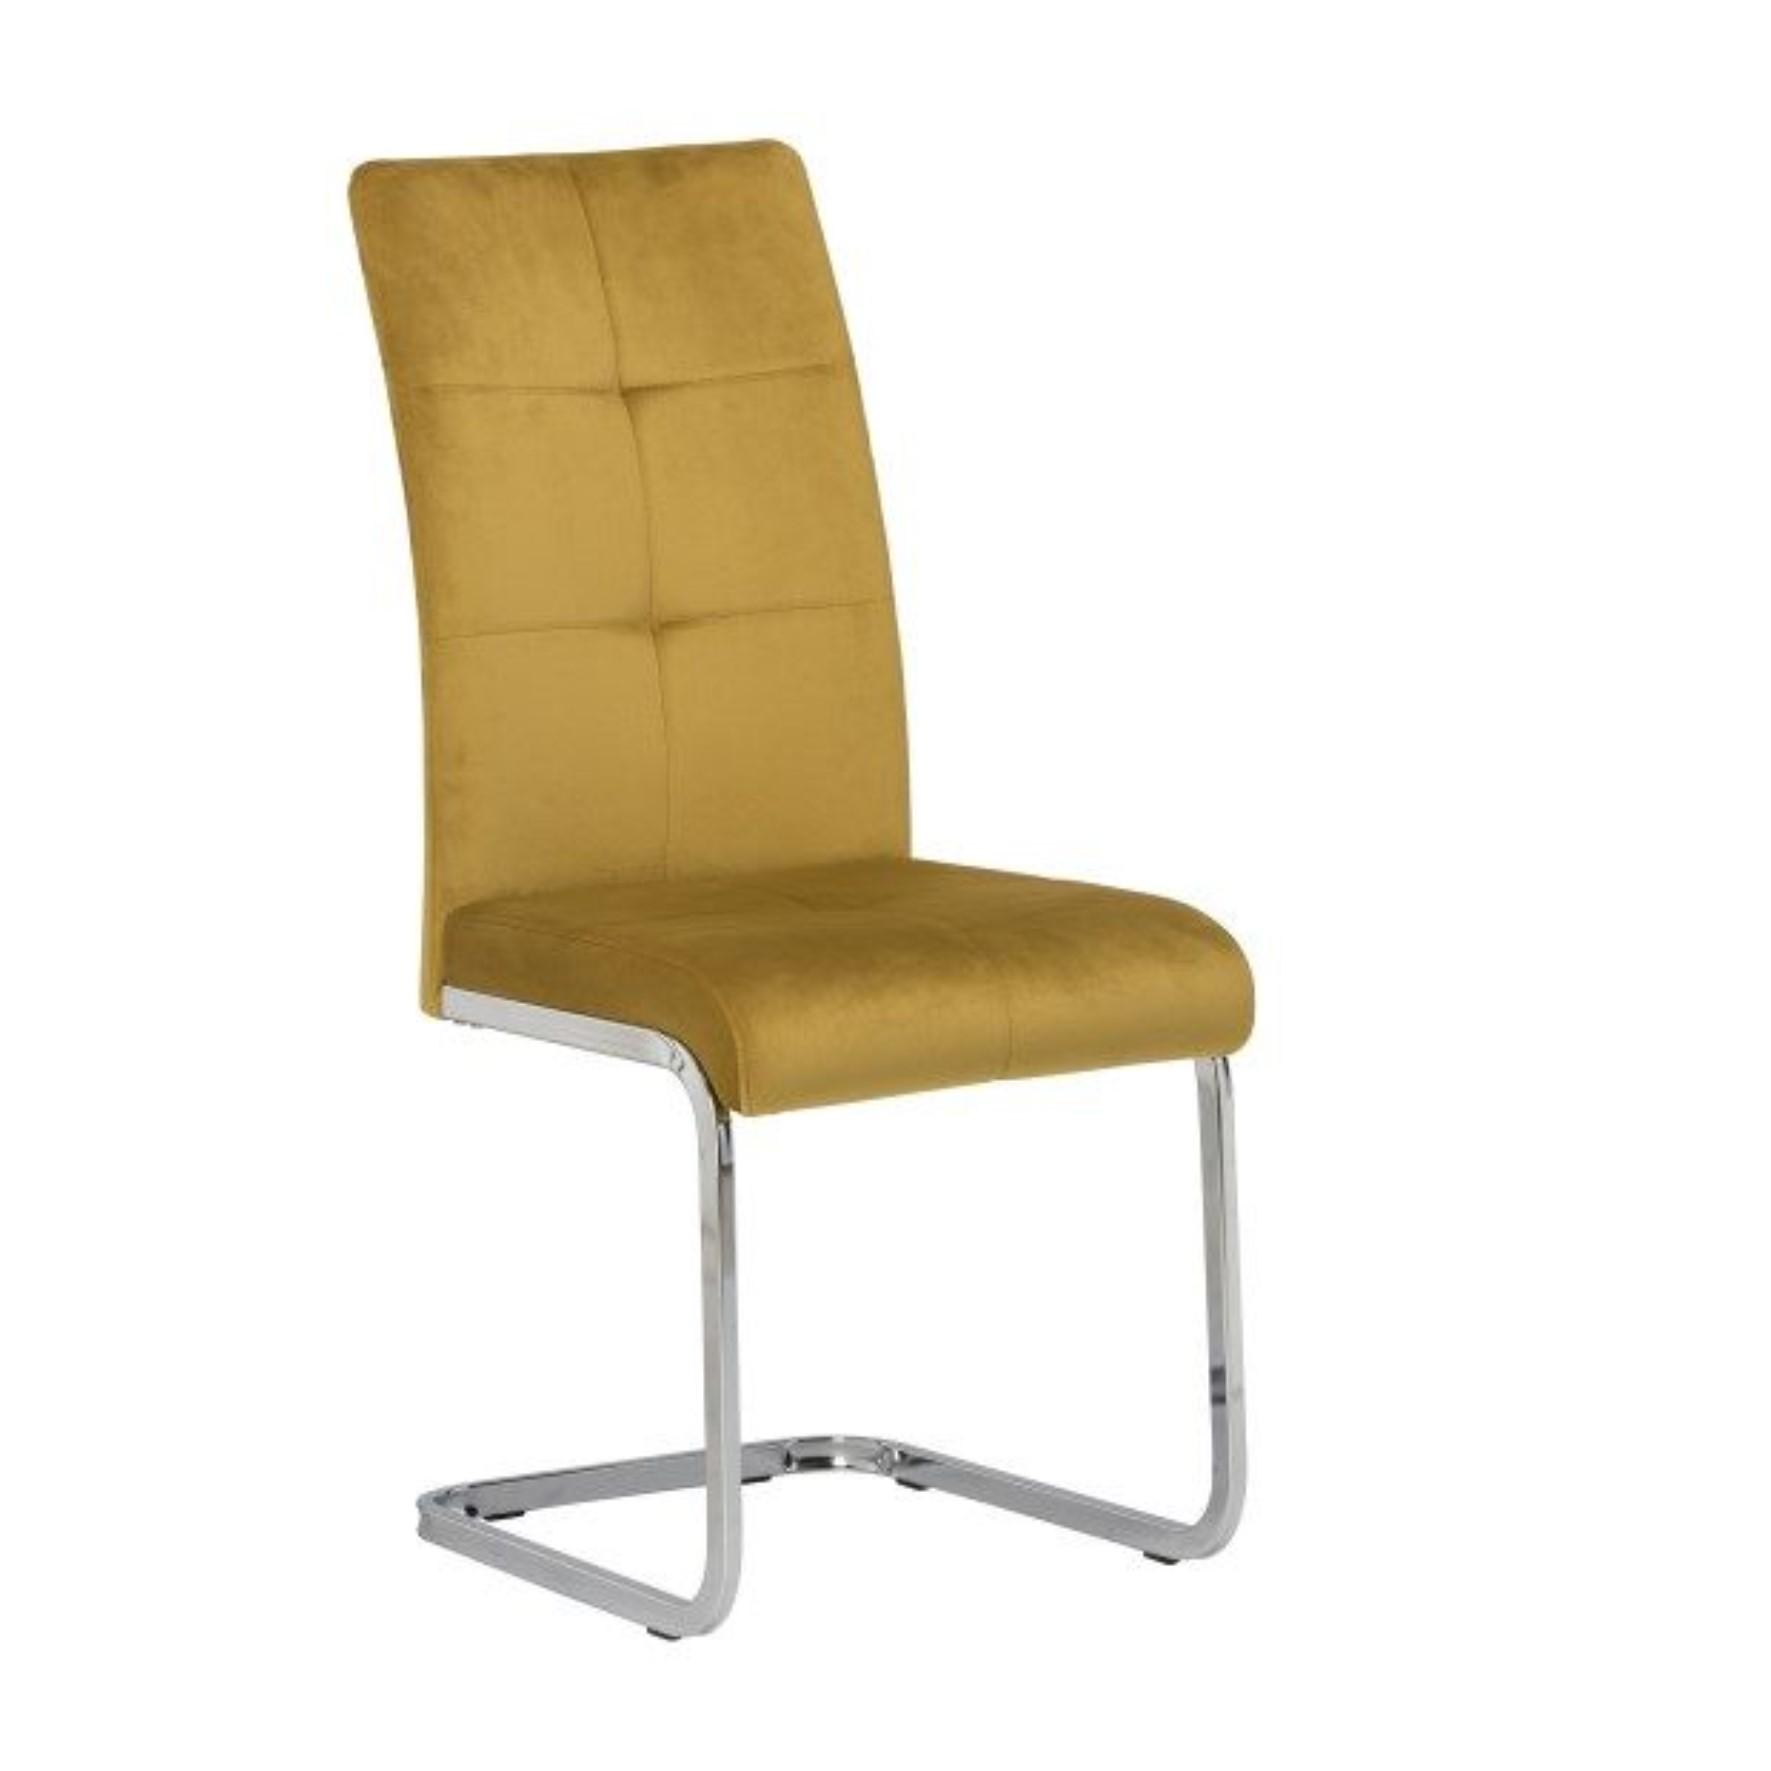 Florenzi Mustard Dining Chair